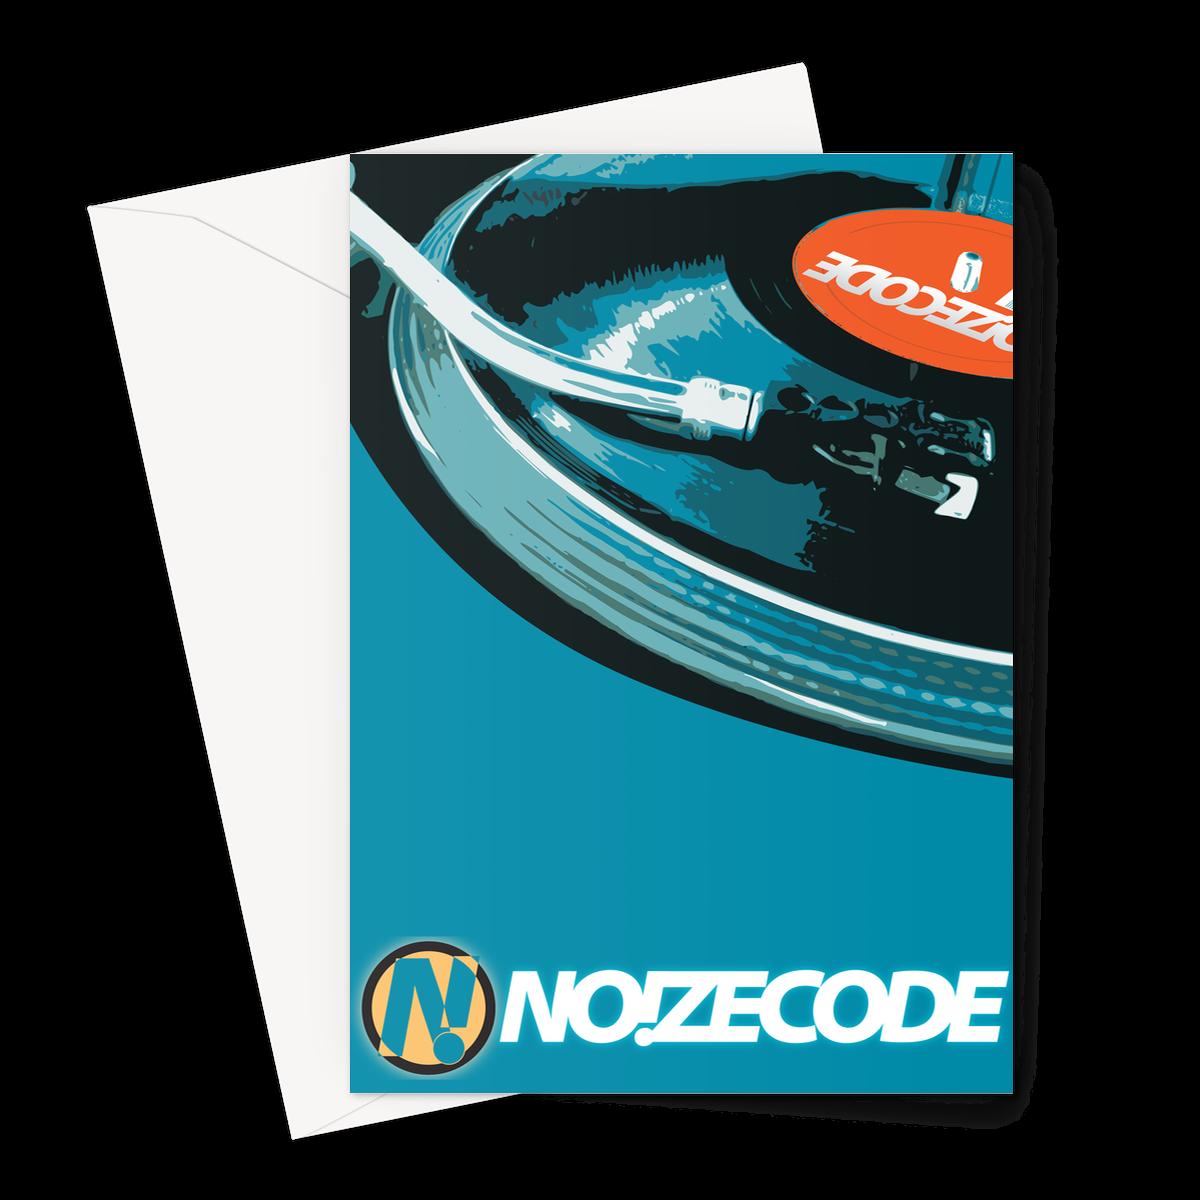 Noizecode Vinyl Greeting Card – 1 Card